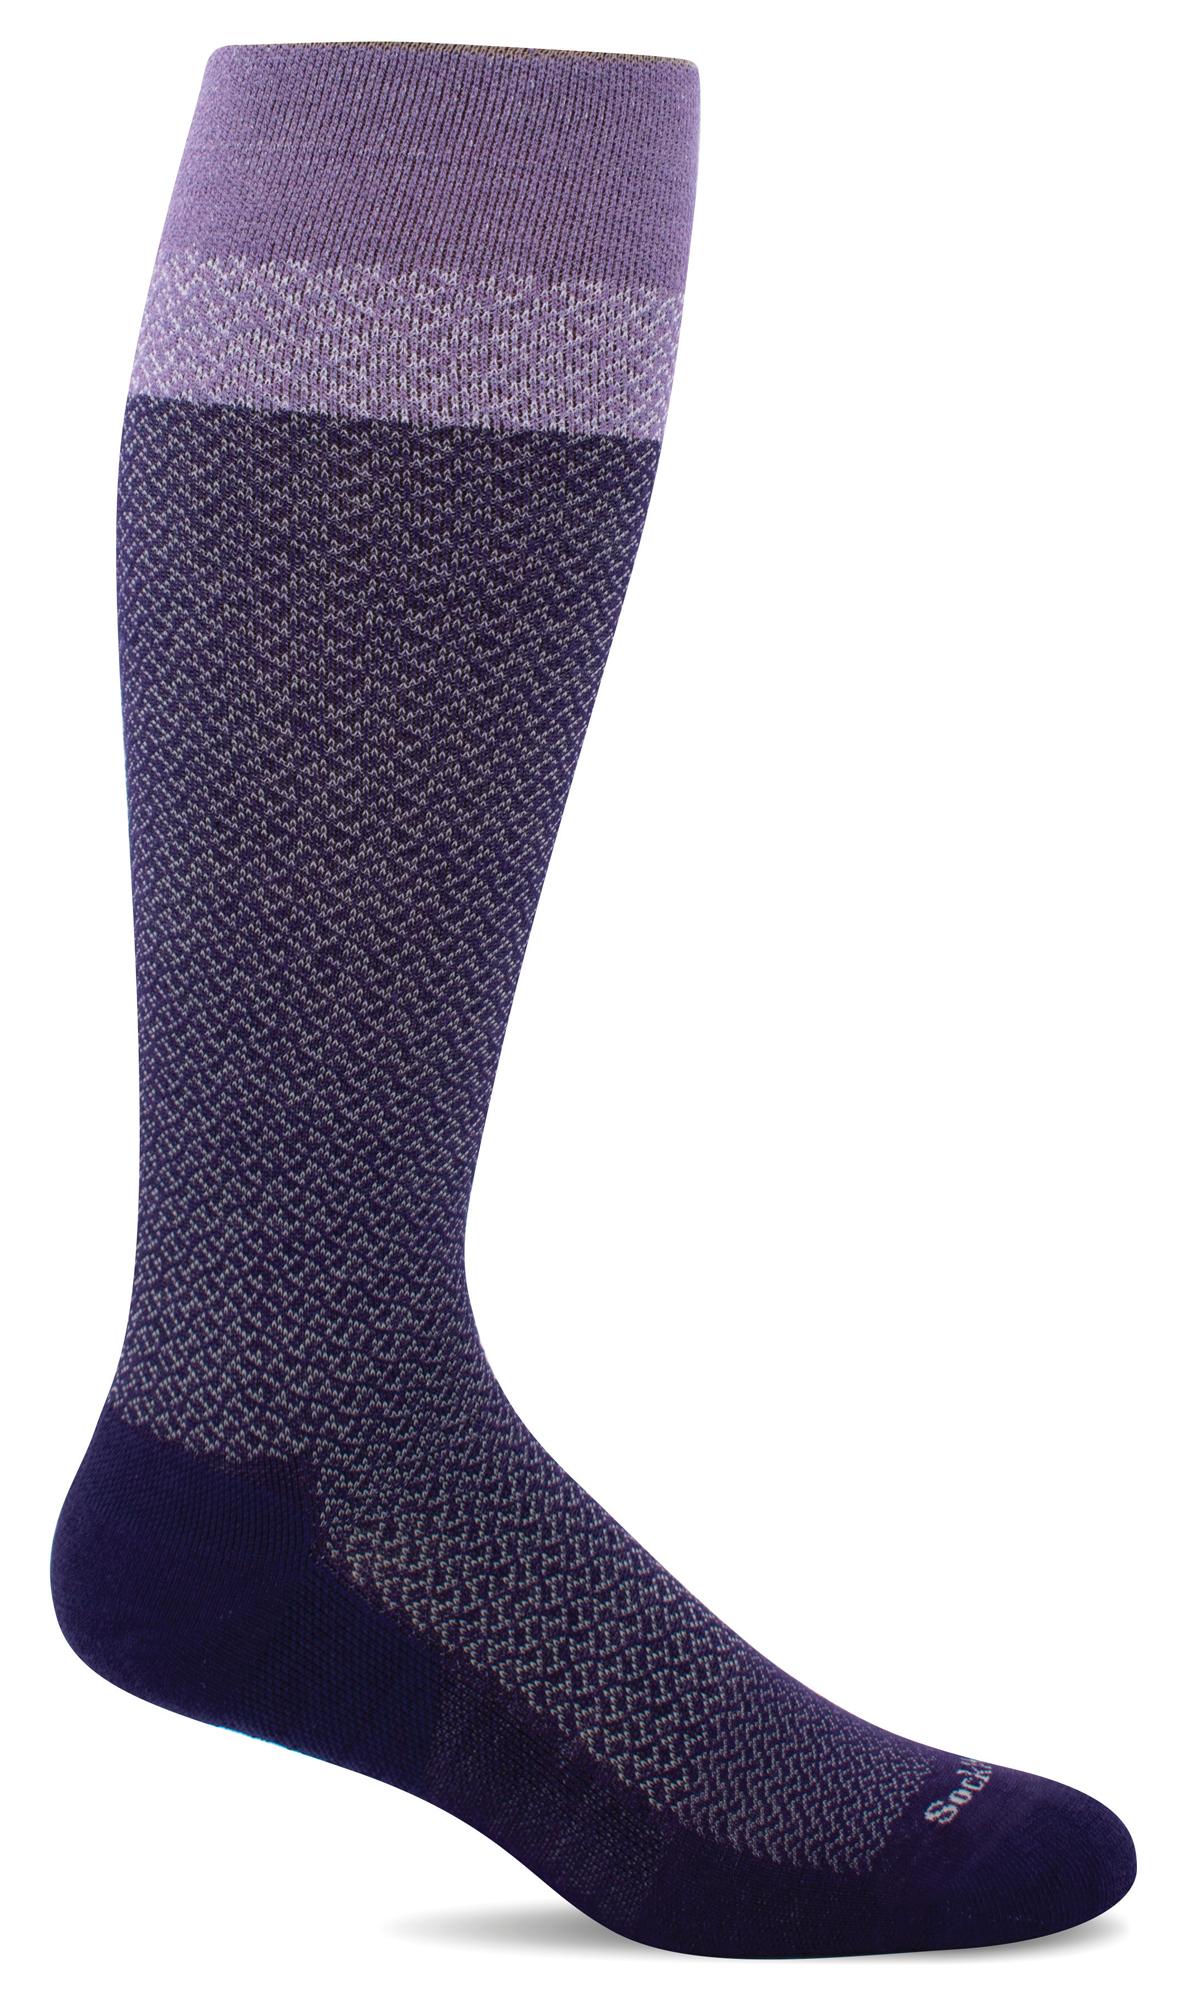 Sockwell 15-20 mmHg WIDE CALF Full Twist Compression Socks-Sockwell